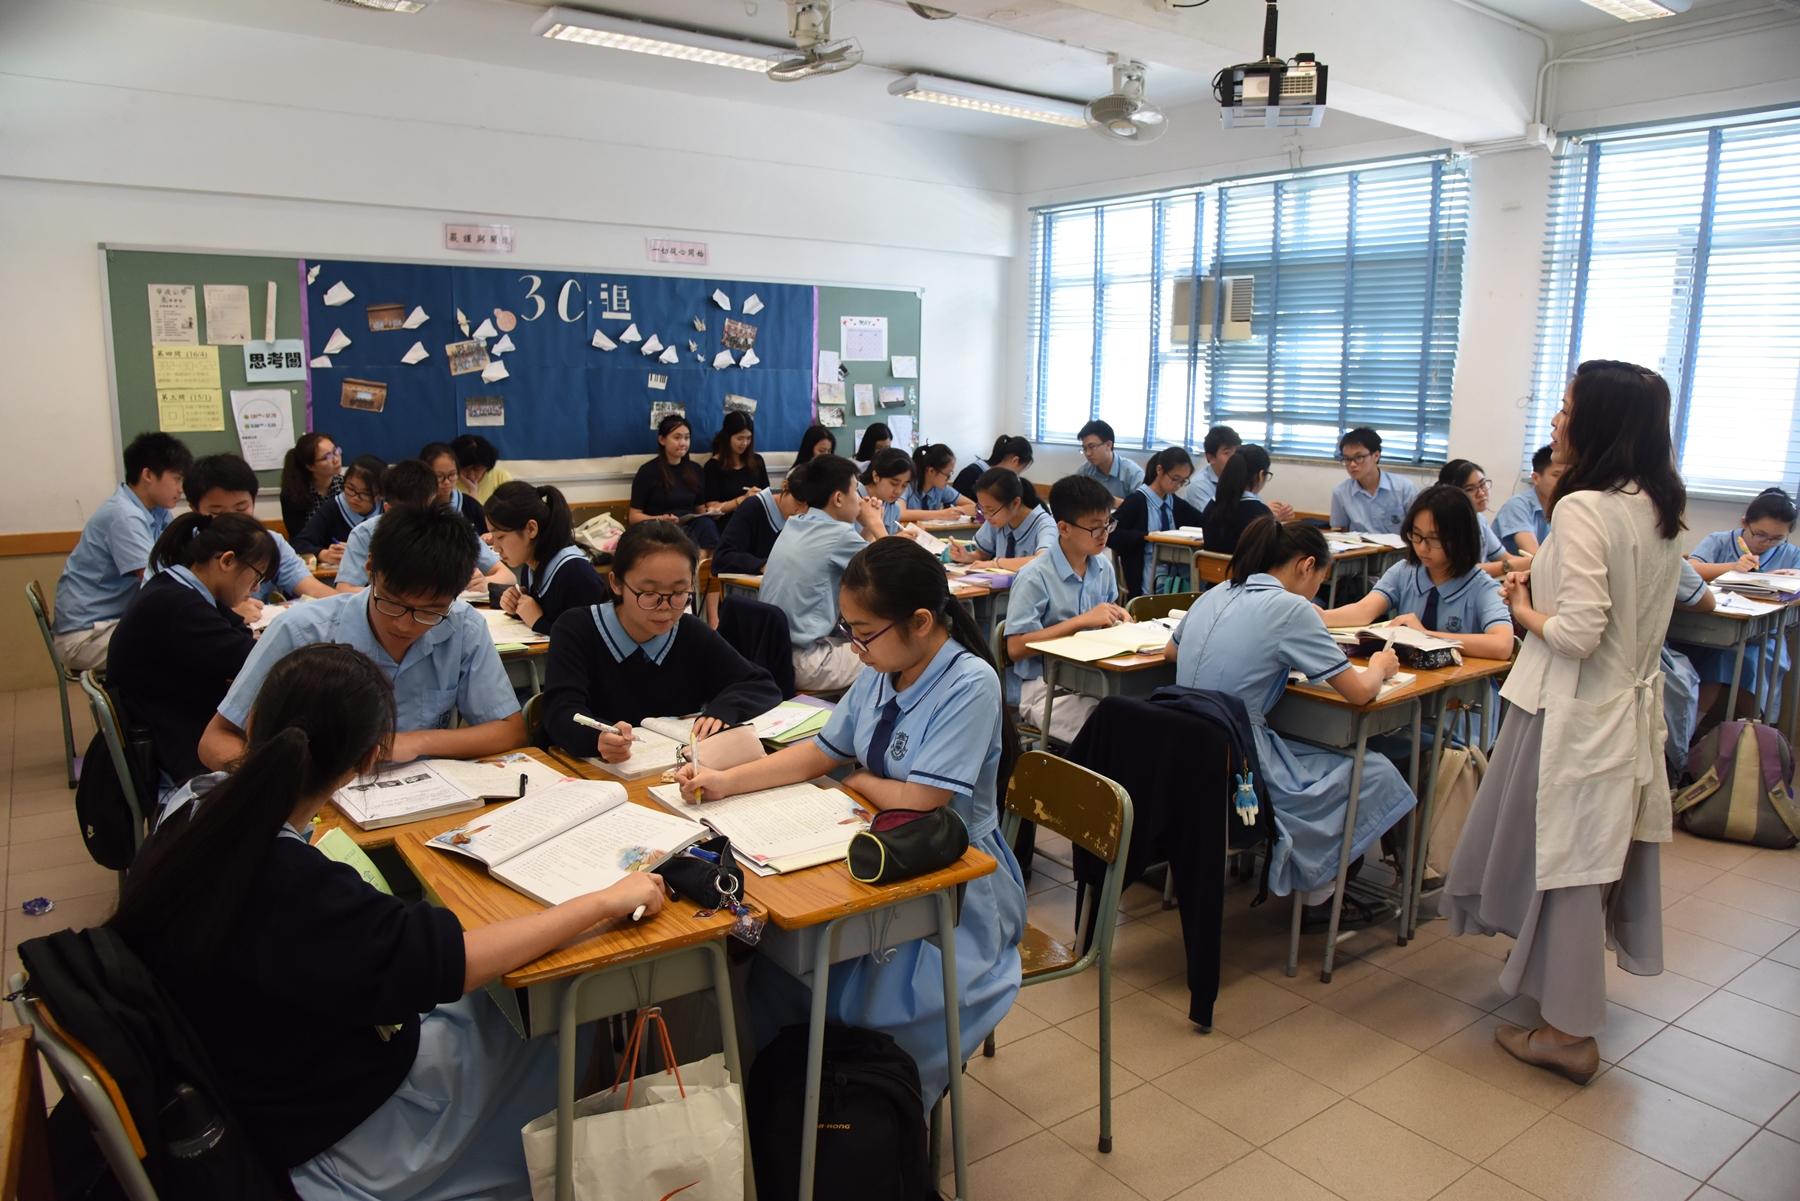 http://npc.edu.hk/sites/default/files/dsc_0696_1.jpg